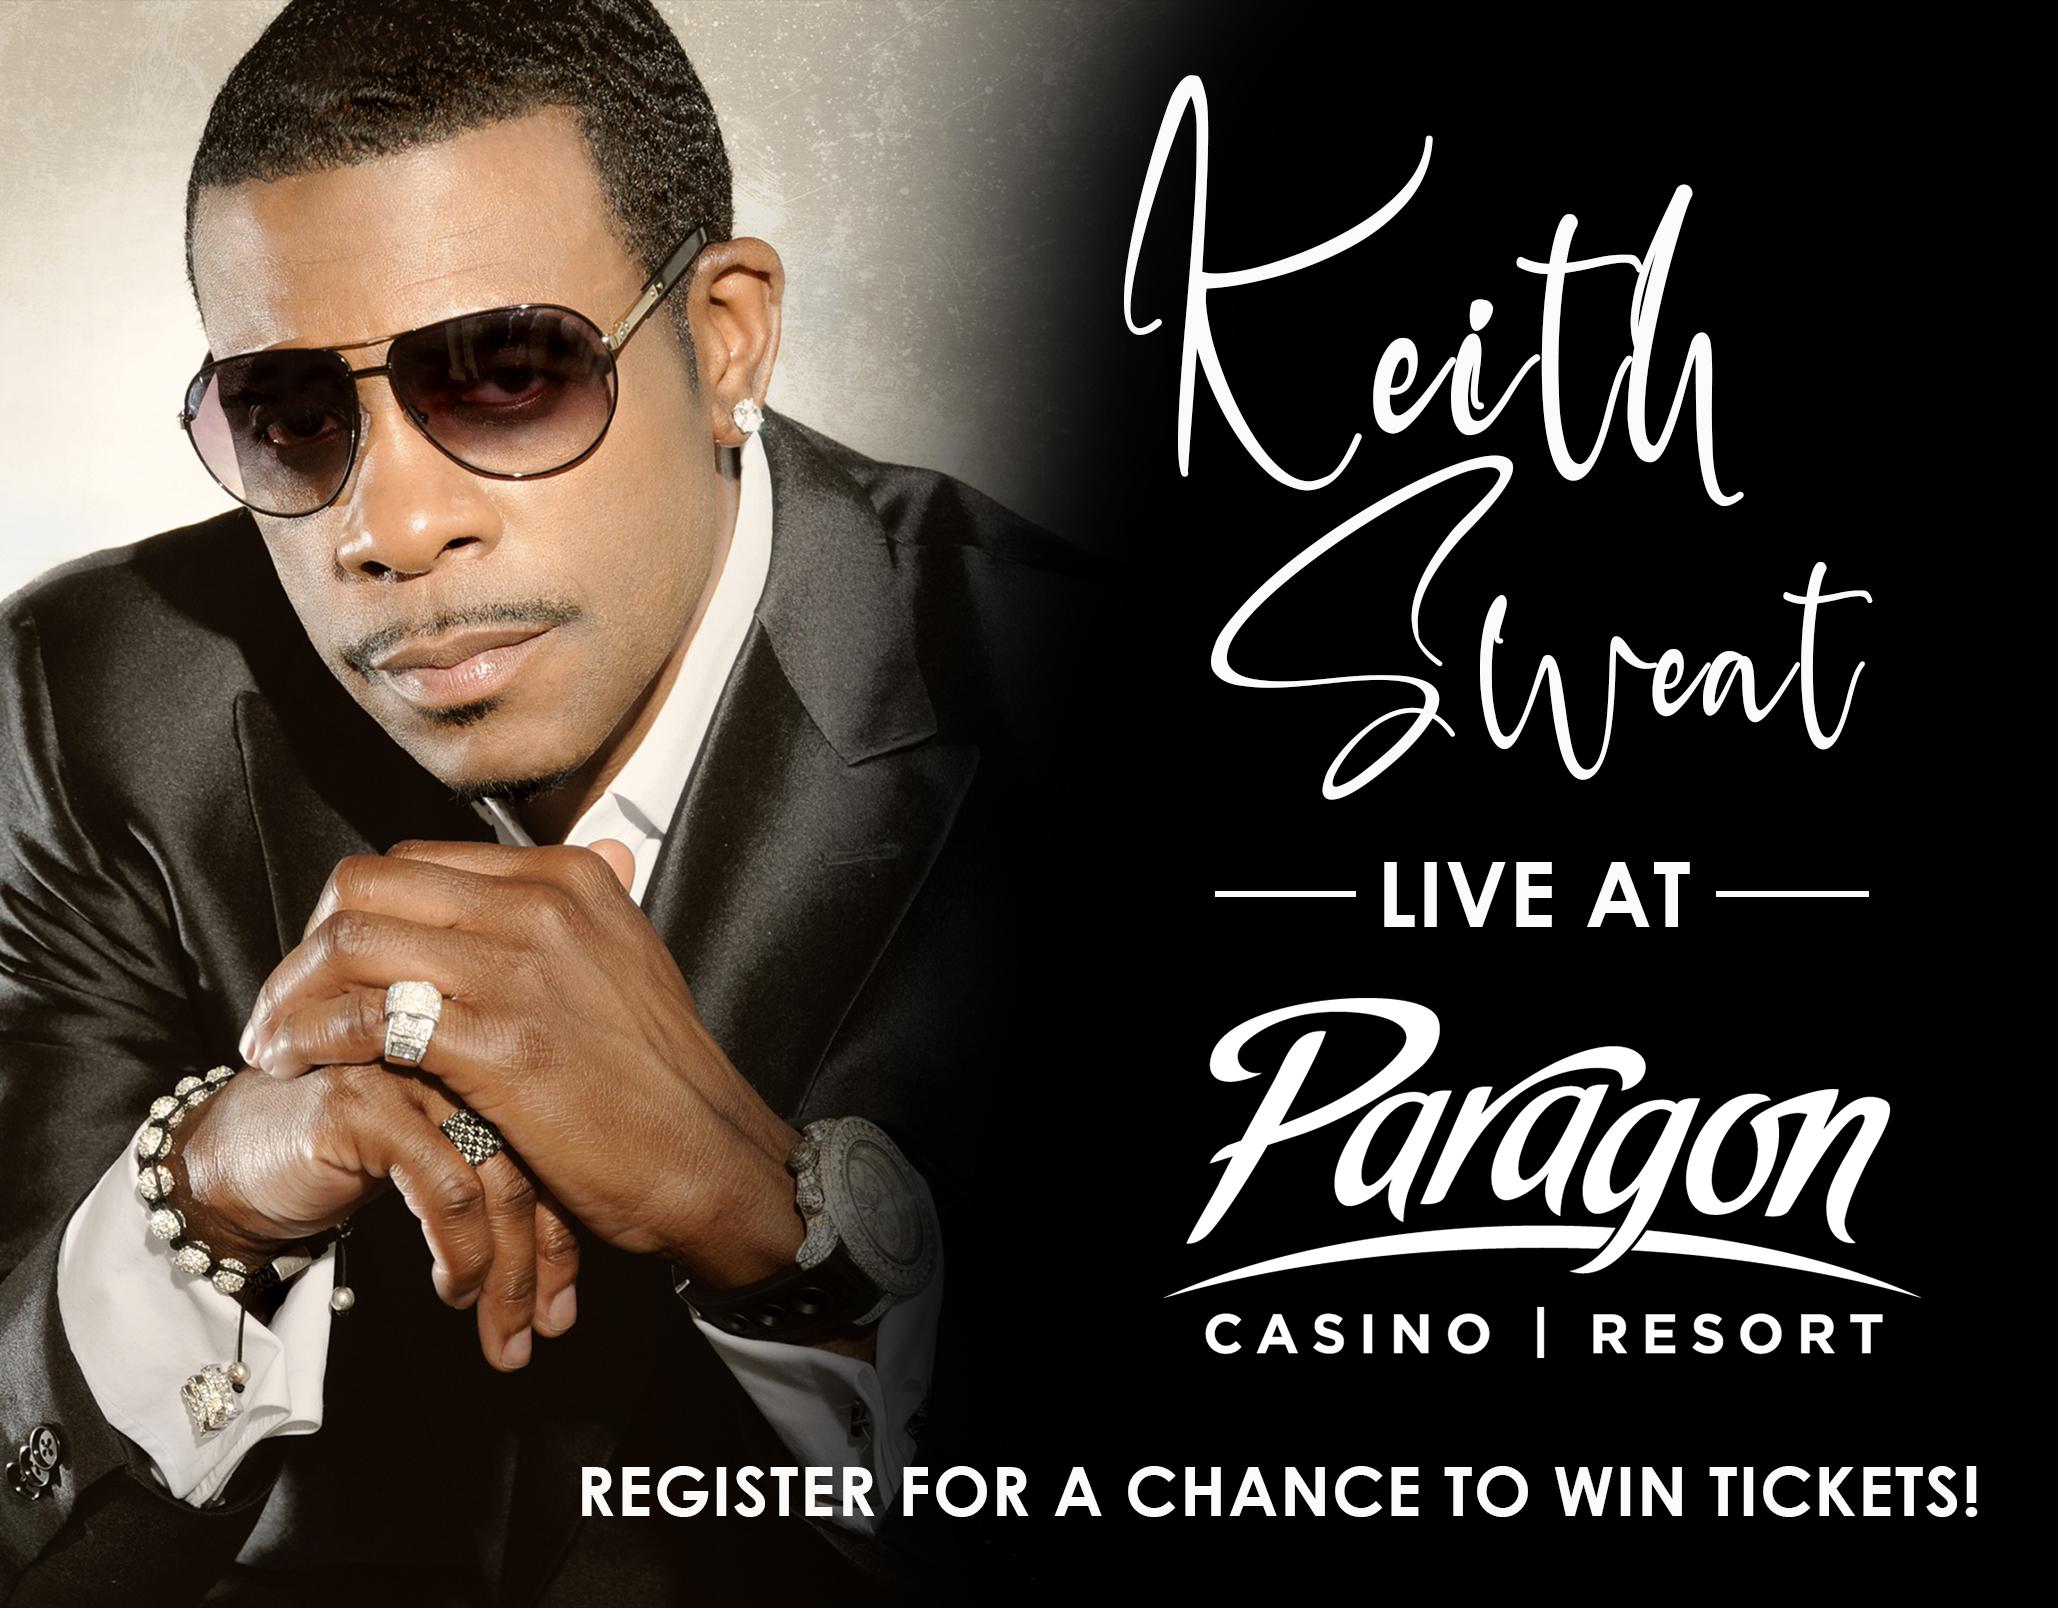 Keith Sweat live @ Paragon Casino!